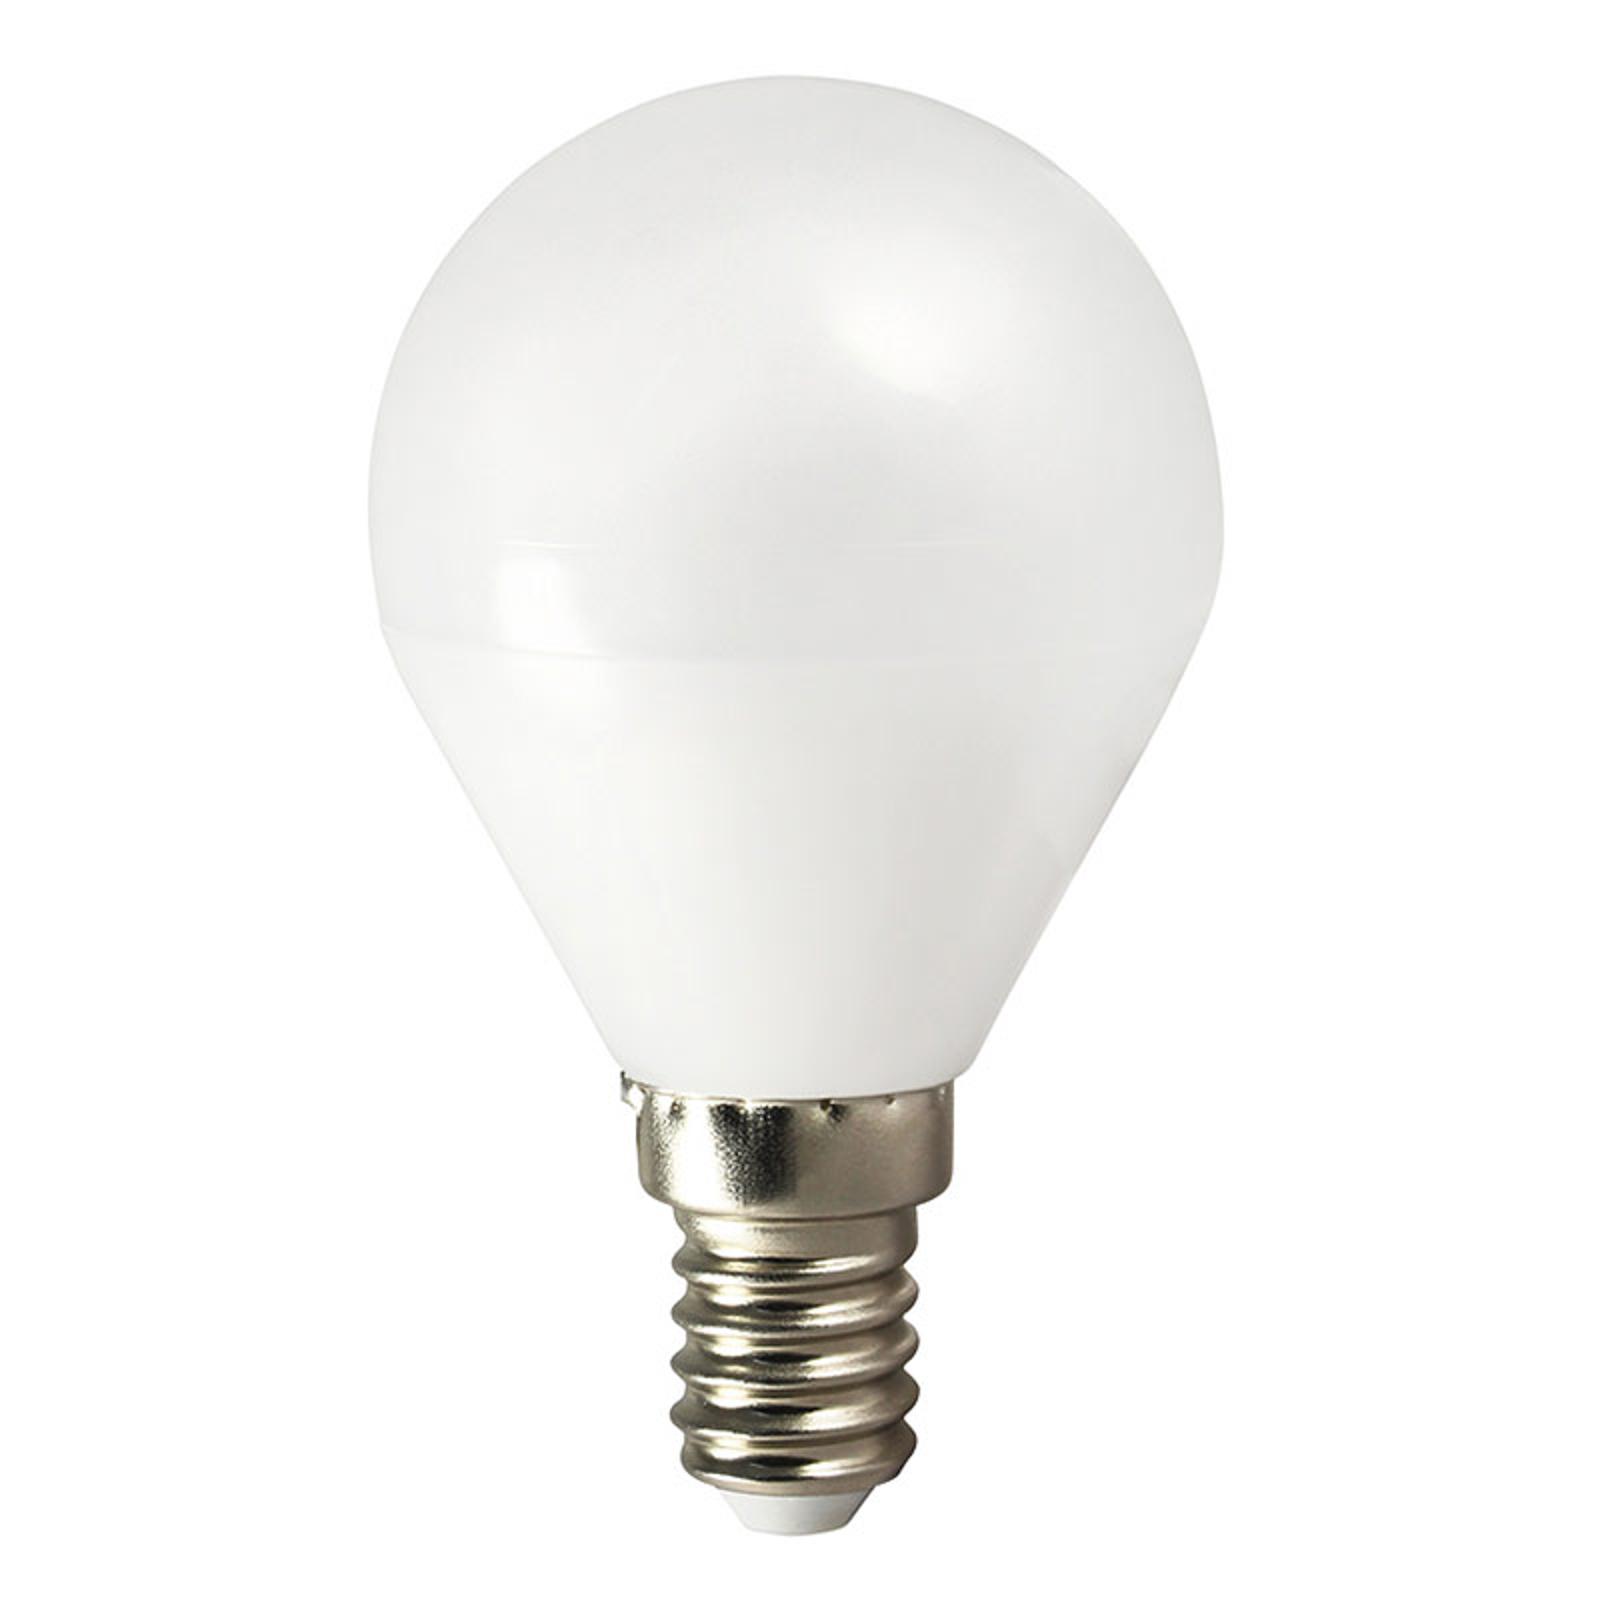 LED-Lampe TEMA E14 5W Tropfen warmweiß für AC/DC